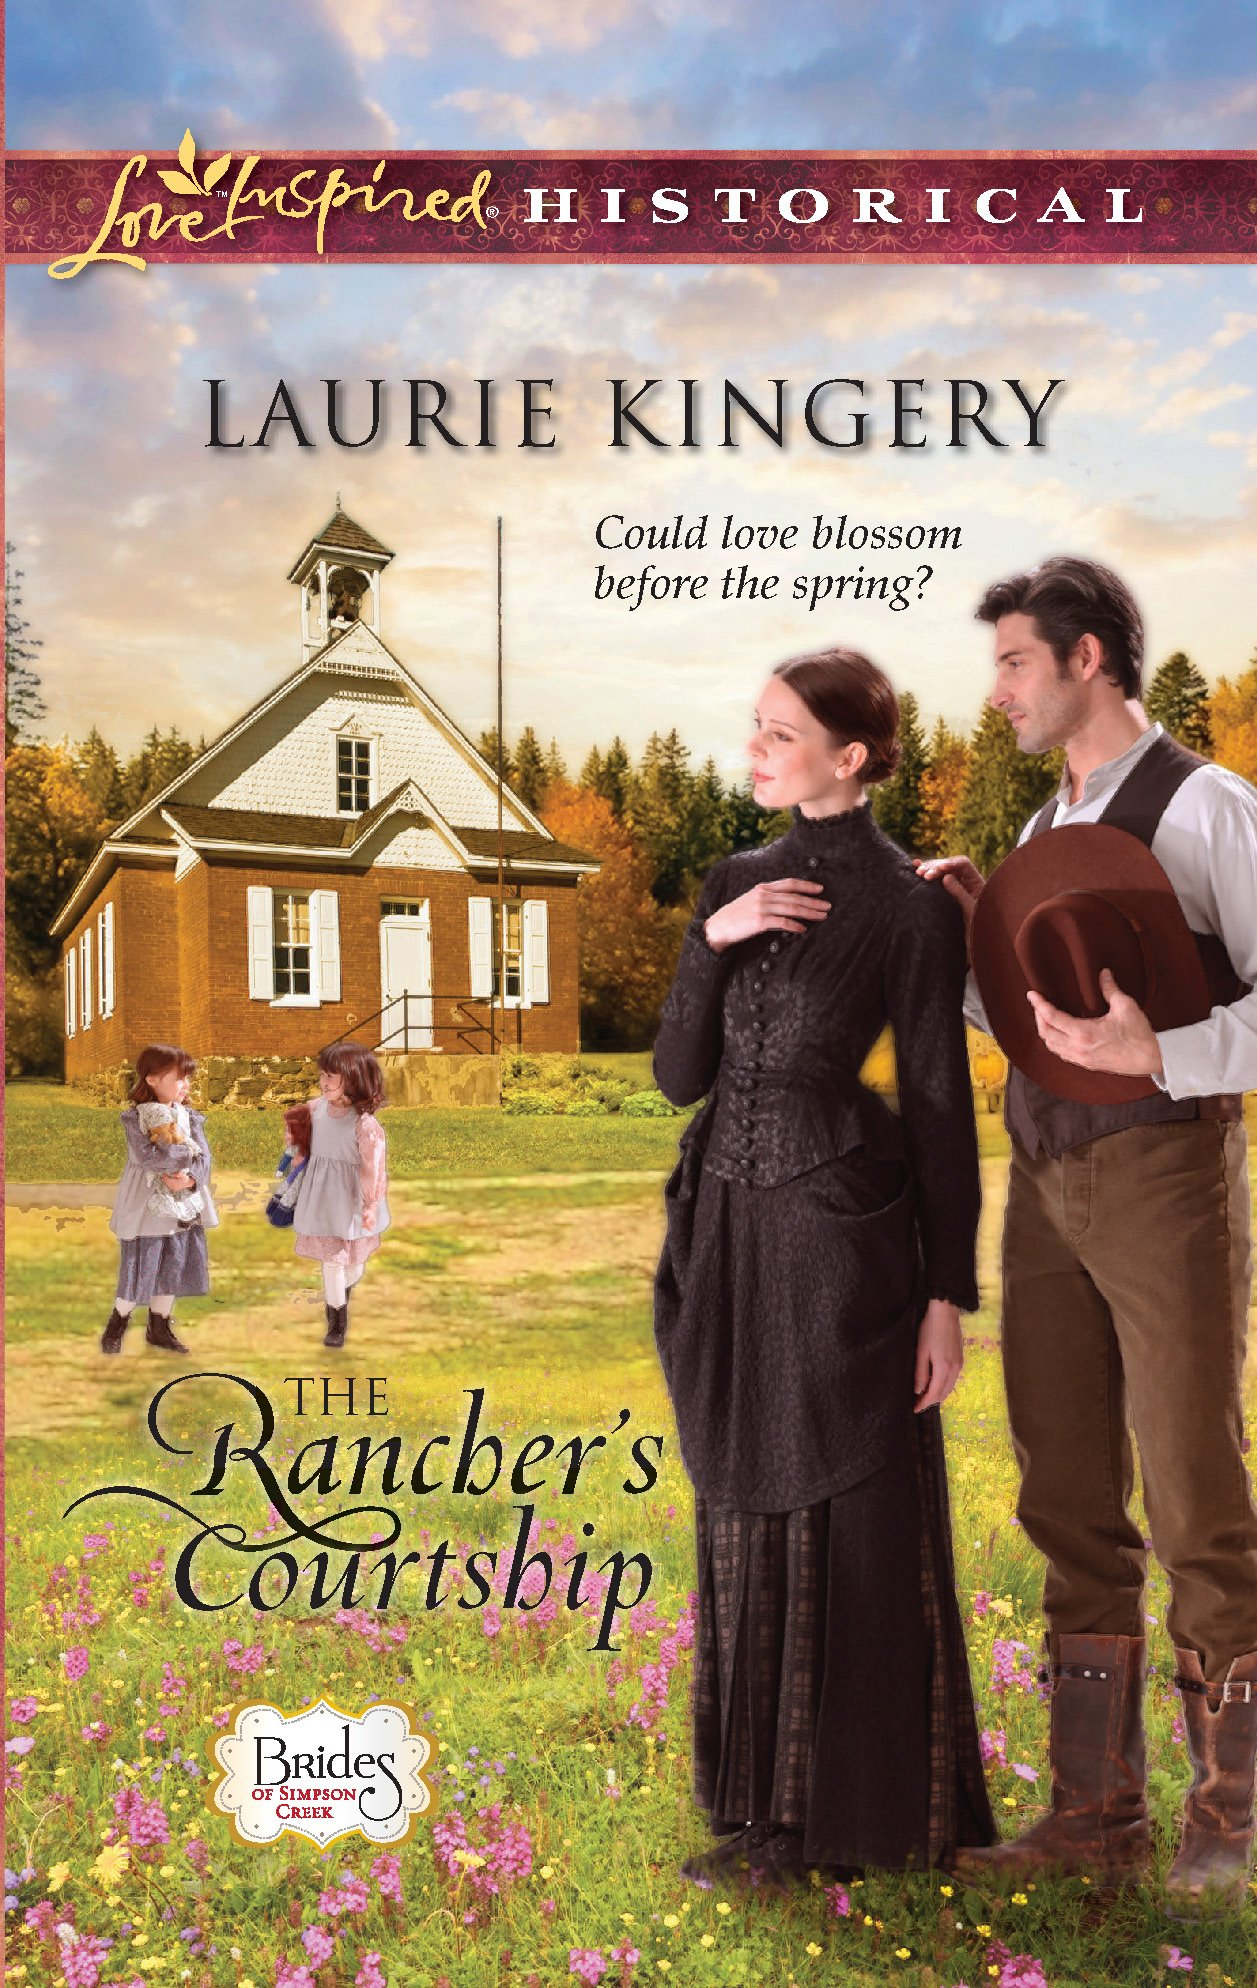 Download The Rancher's Courtship (Brides of Simpson Creek) PDF